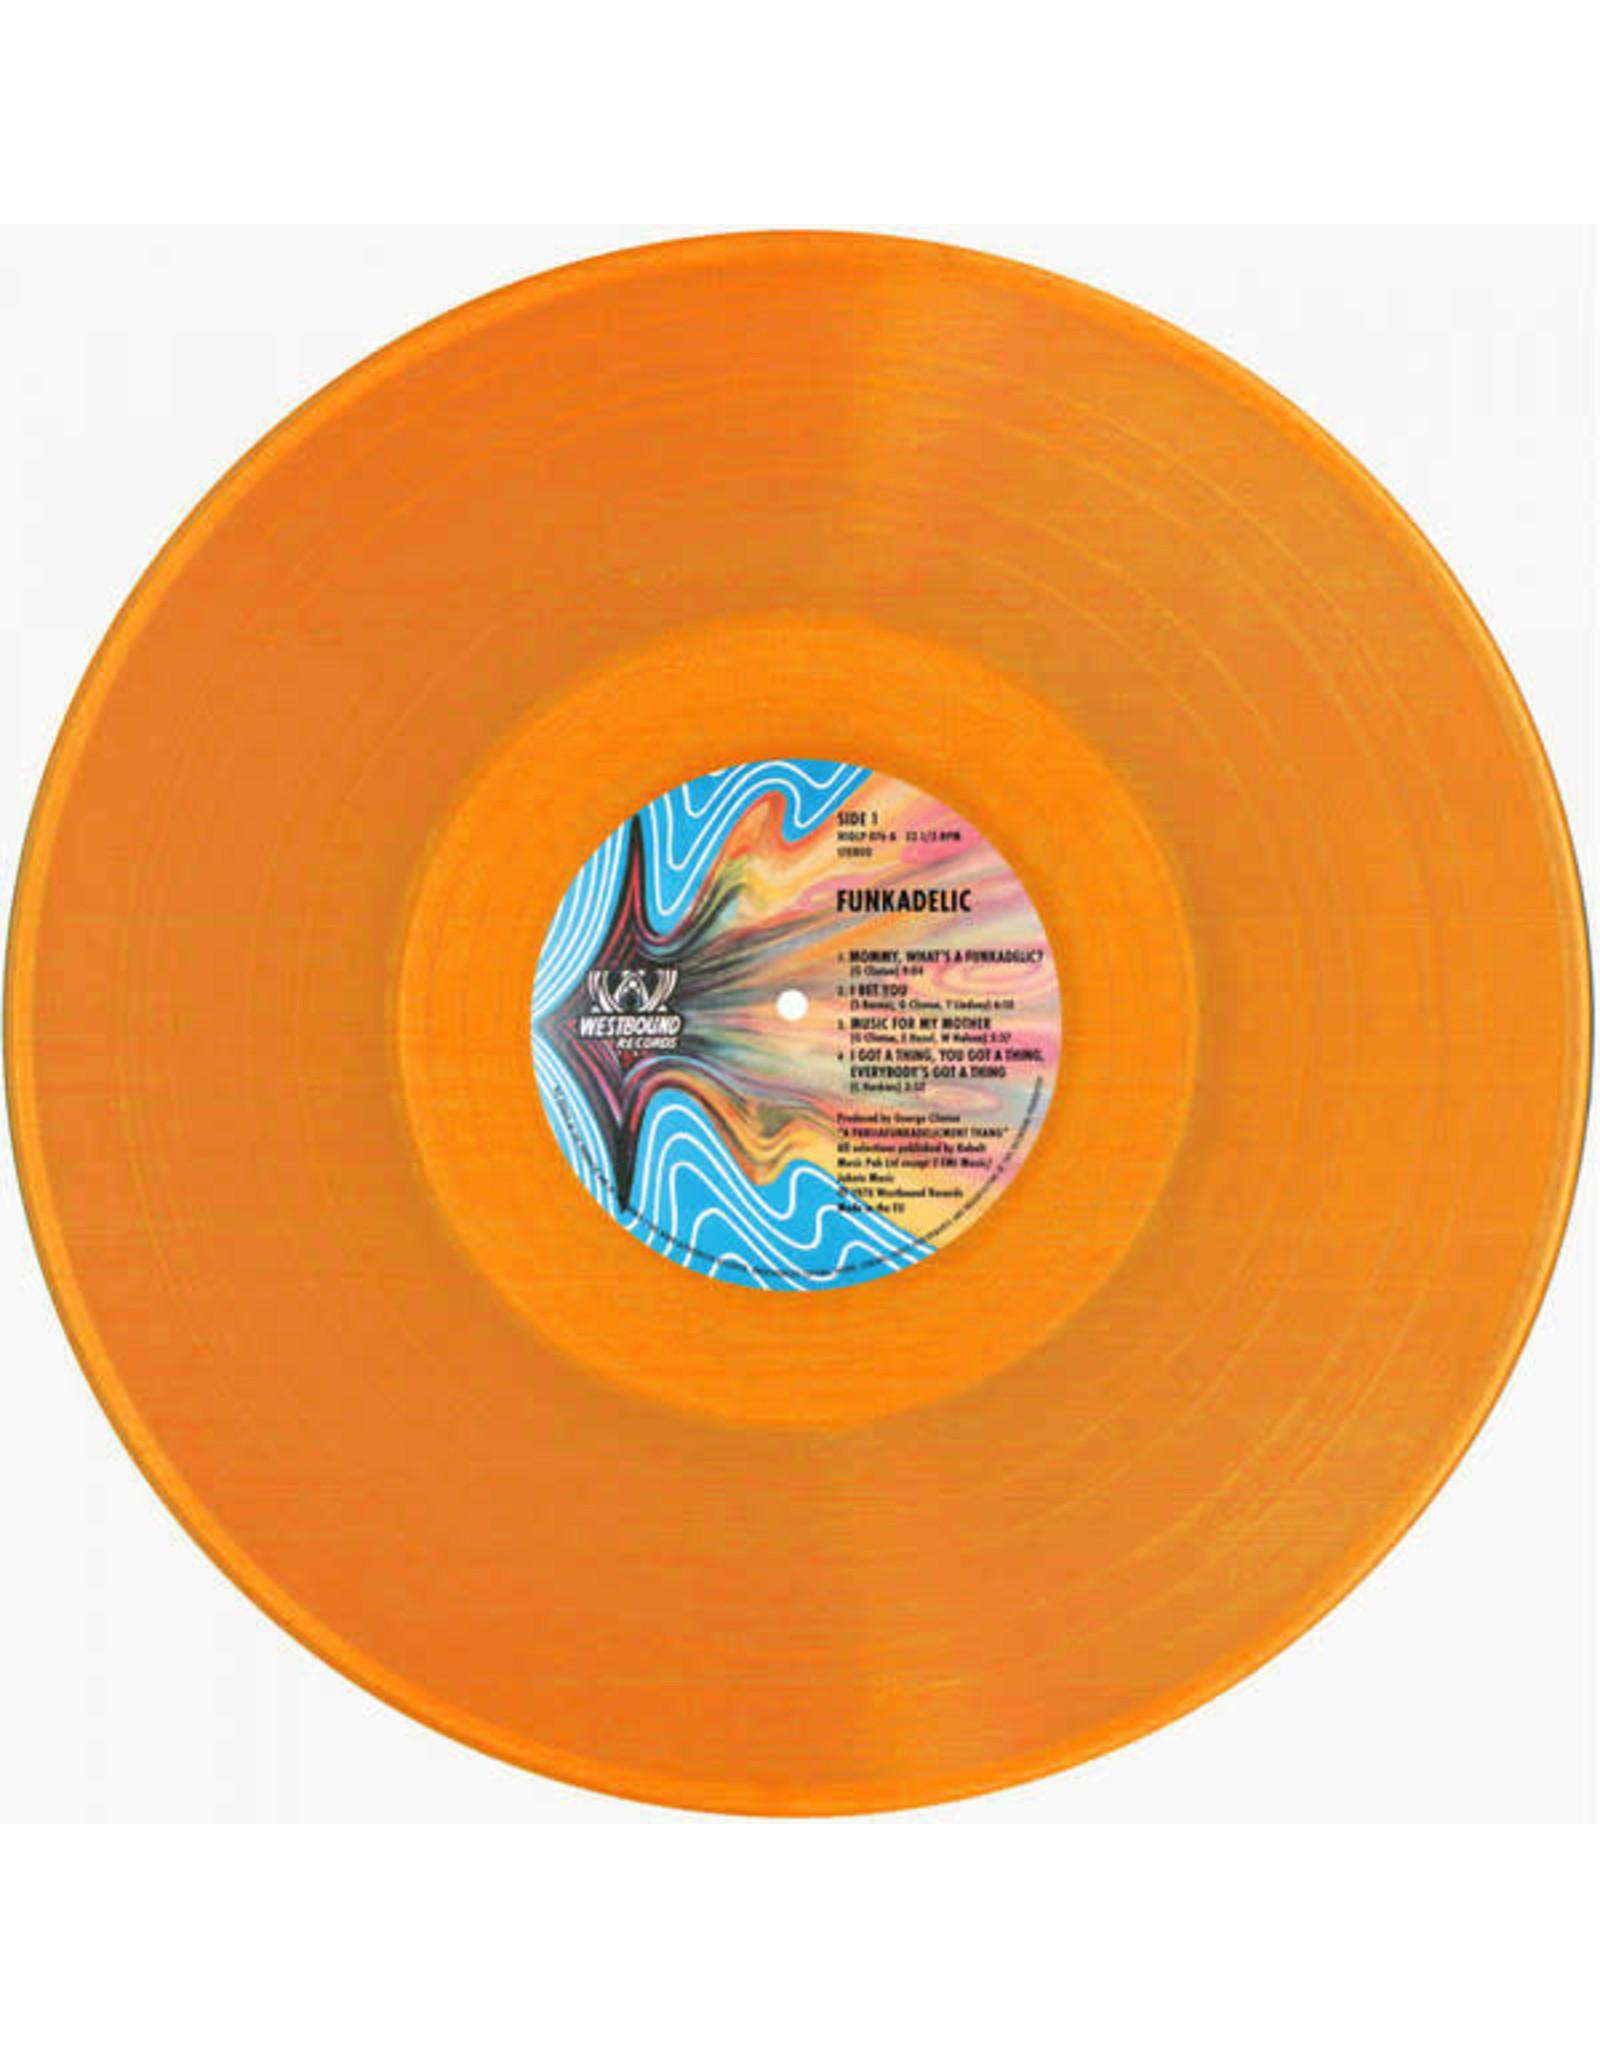 Funkadelic - ST LP Orange 50th anniv